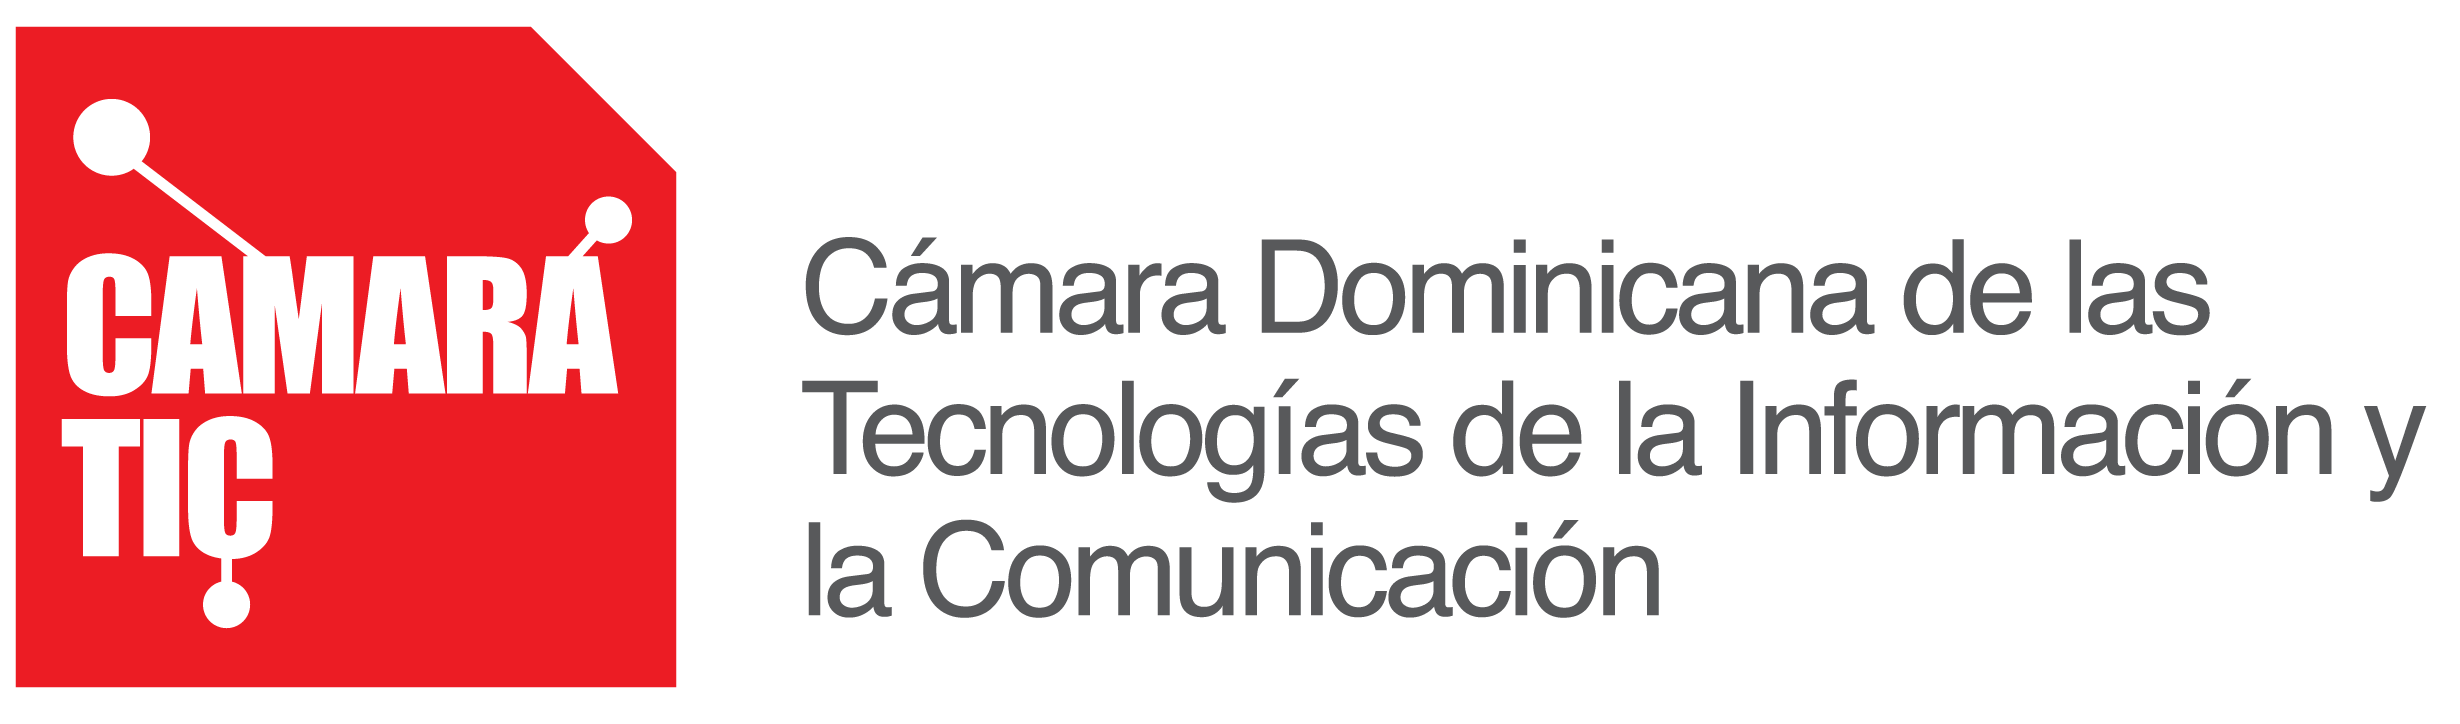 logo-camara-tic01